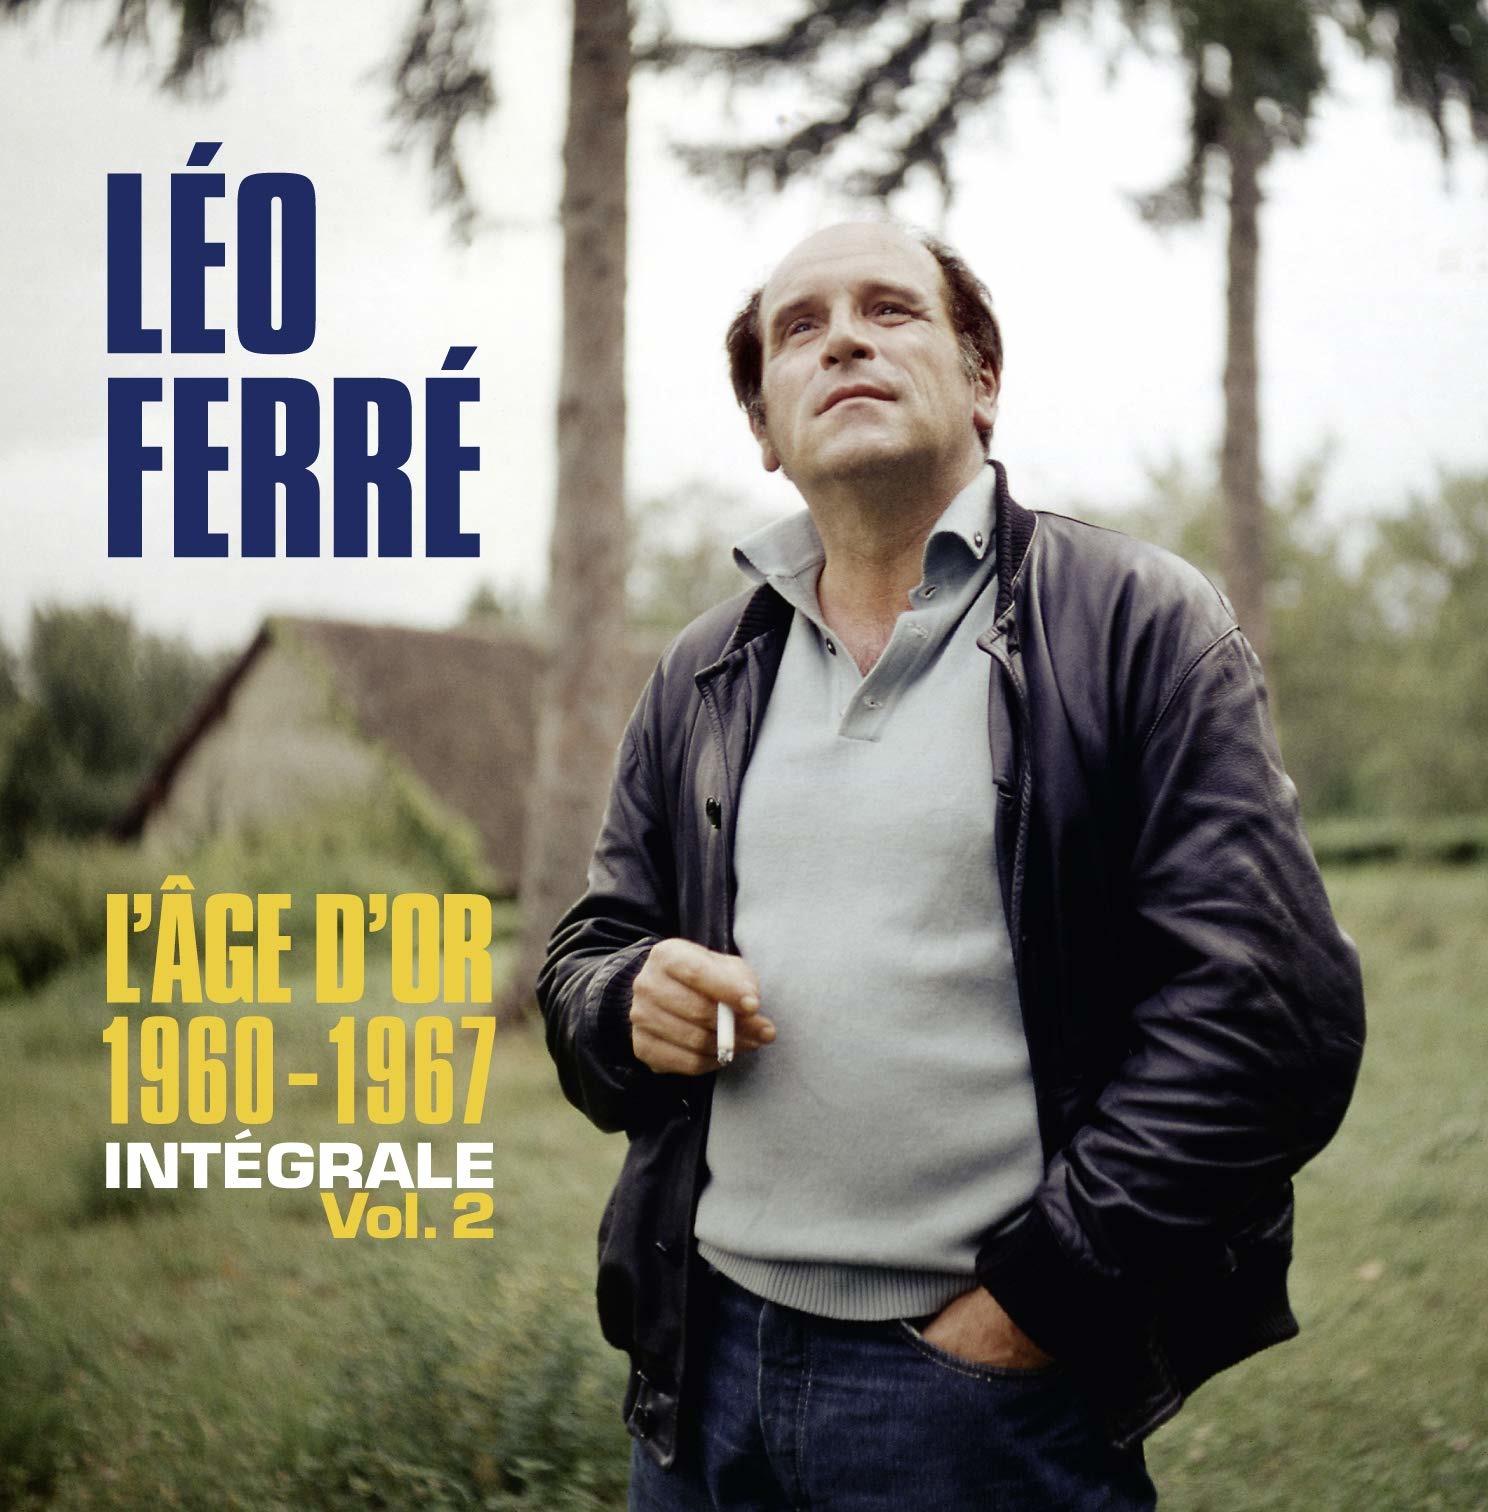 Integrale 1960-1967 / L'age D'or - Leo Ferre - Musik - UNIVERSAL - 0600753917589 - 18/9-2020